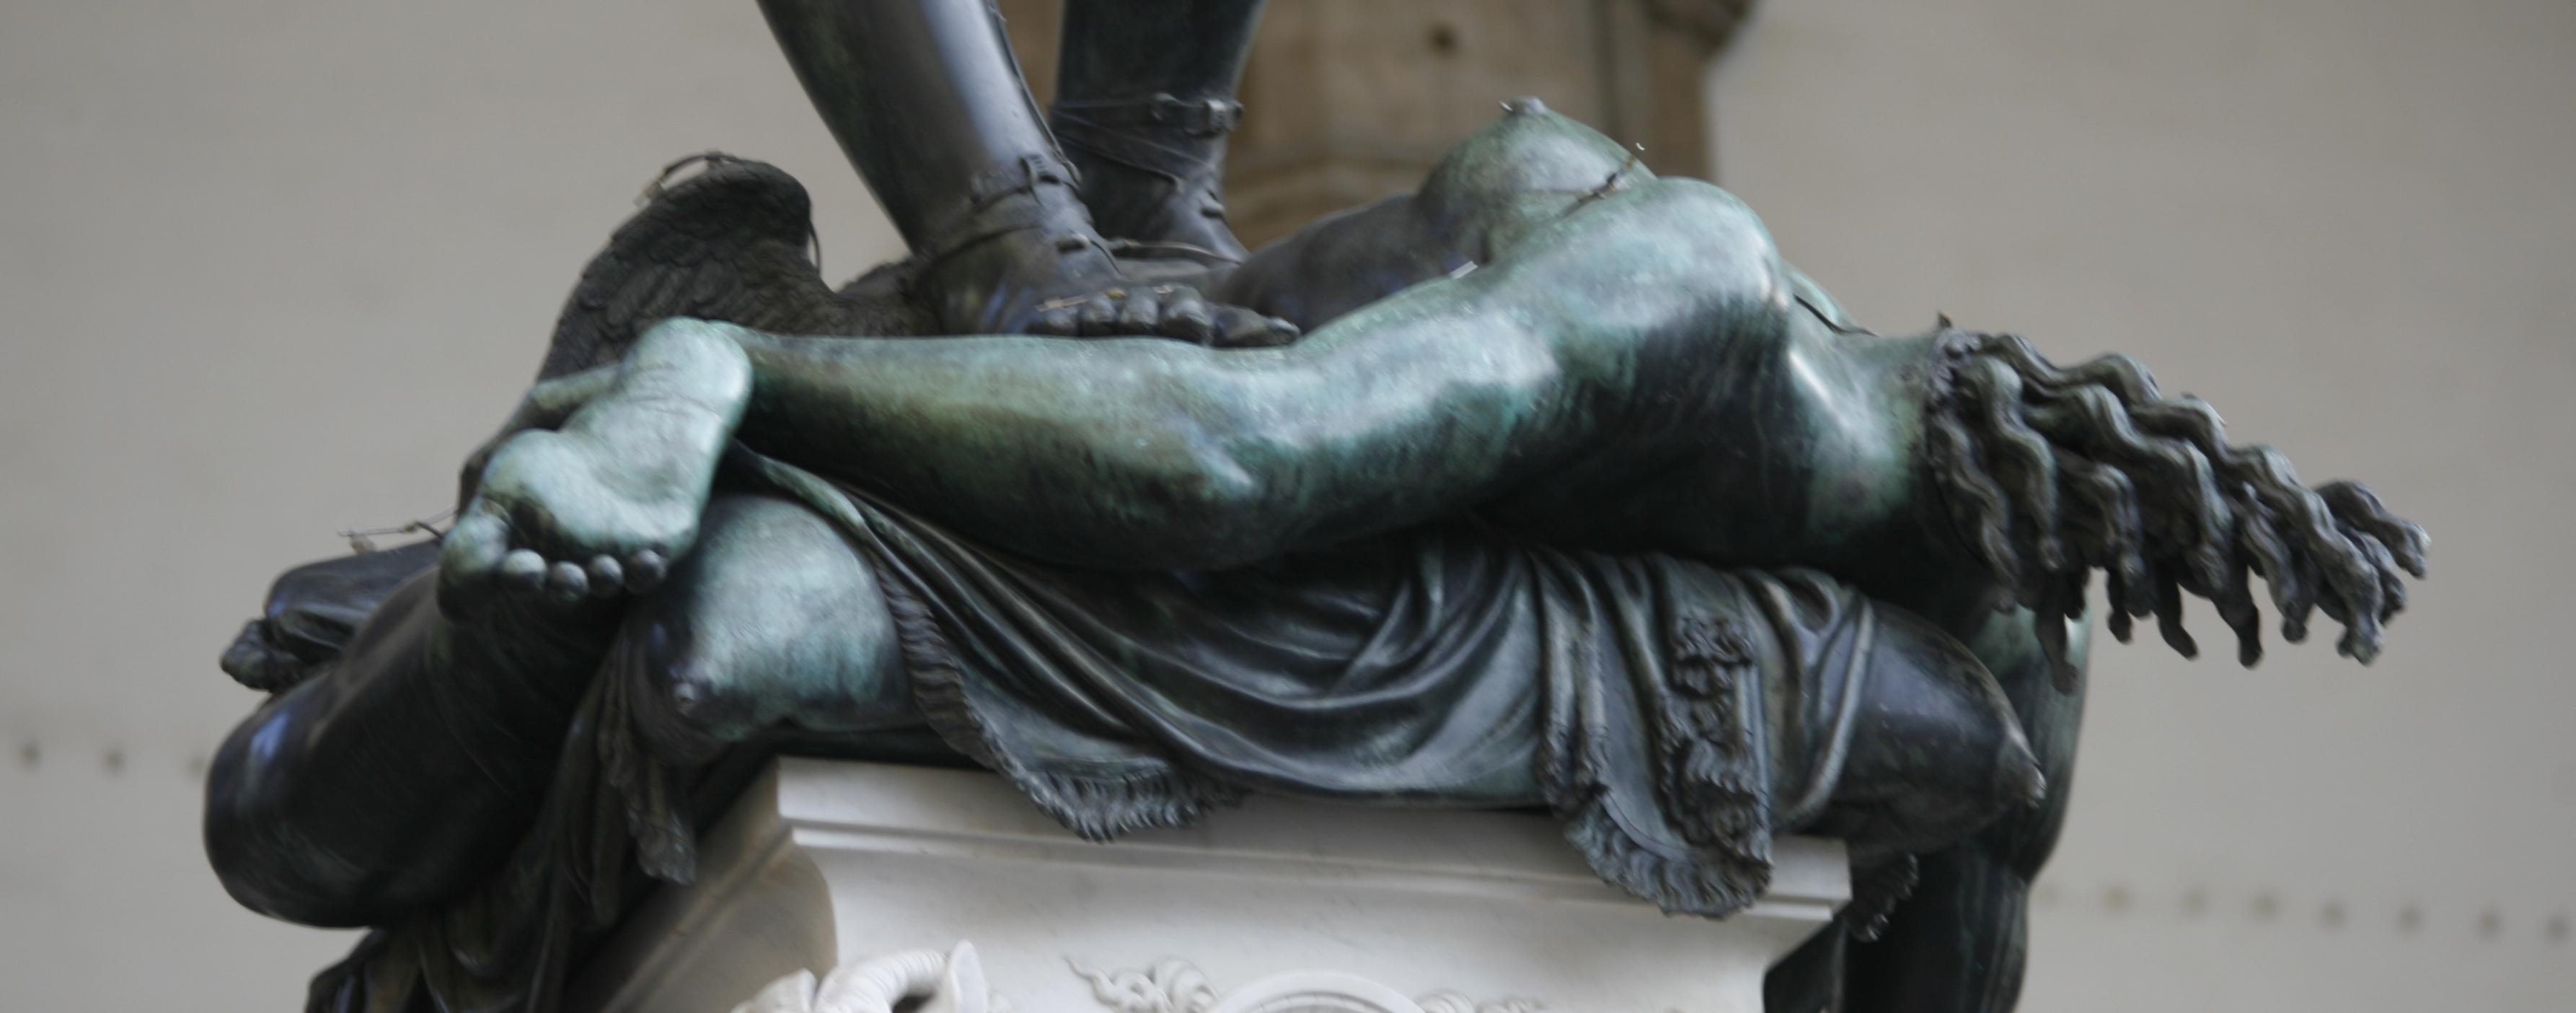 Perseus With The Head Of Medusa Benvenuto Cellini